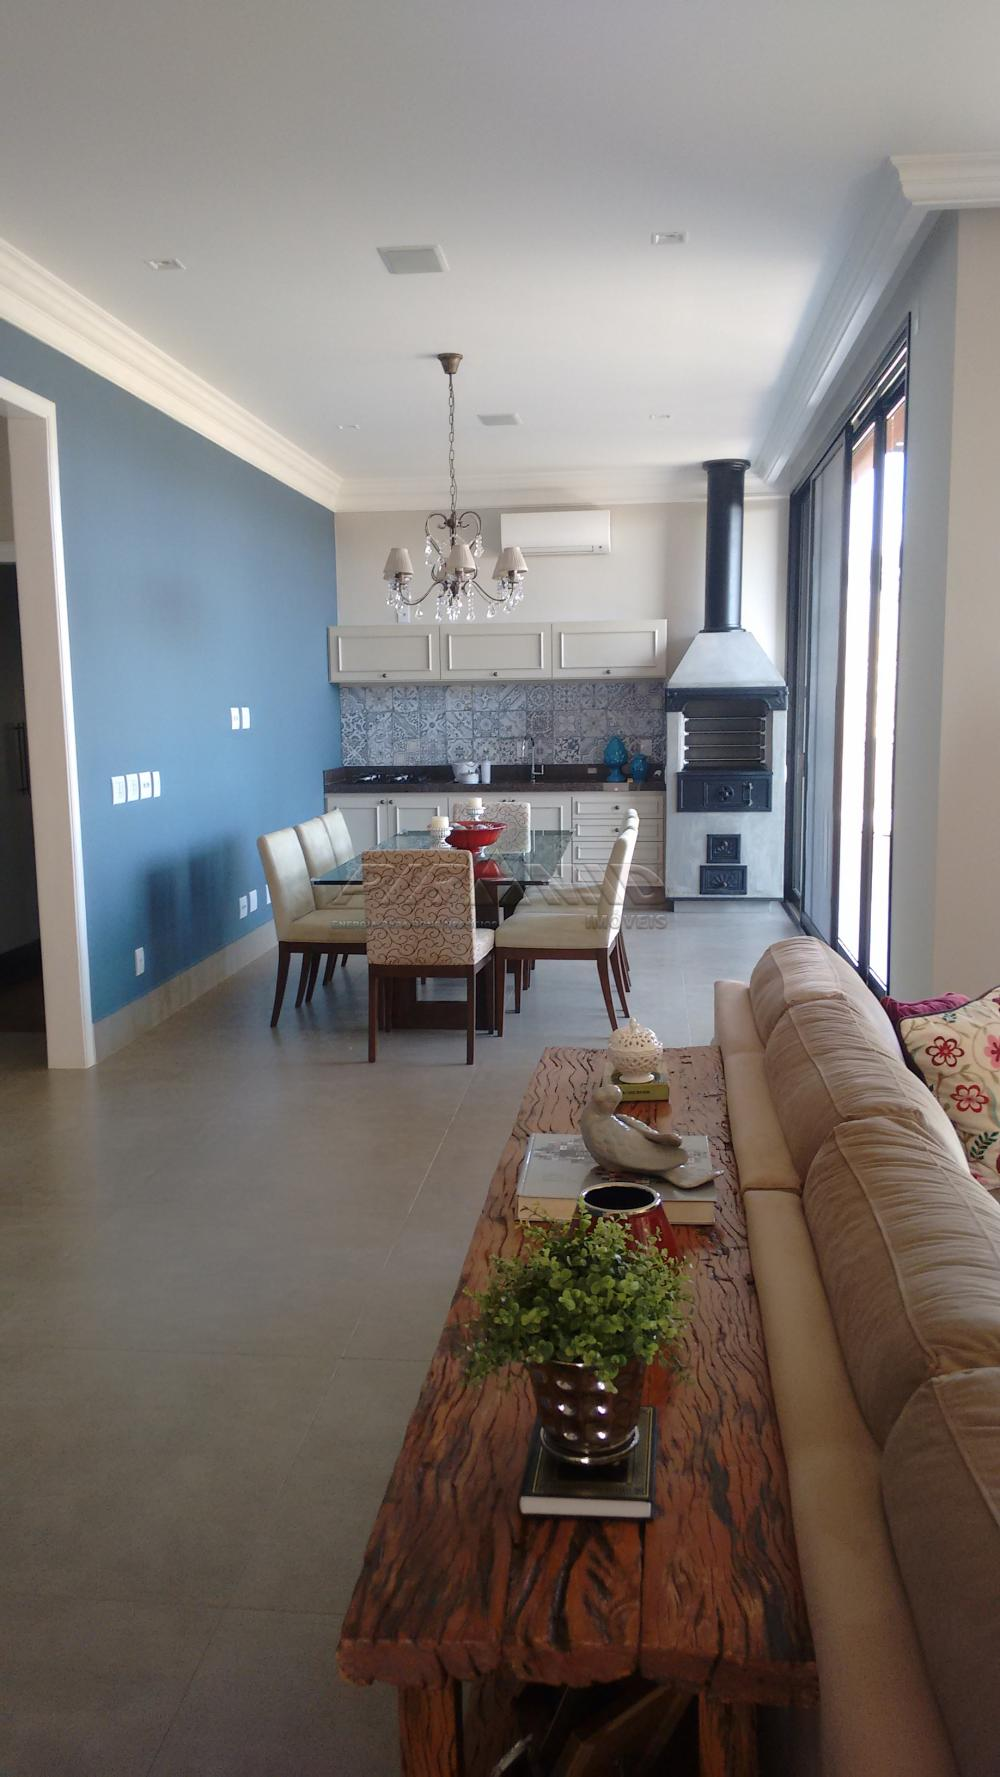 Ribeirao Preto Casa Venda R$1.350.000,00 Condominio R$550,00 3 Dormitorios 3 Suites Area do terreno 548.18m2 Area construida 256.05m2